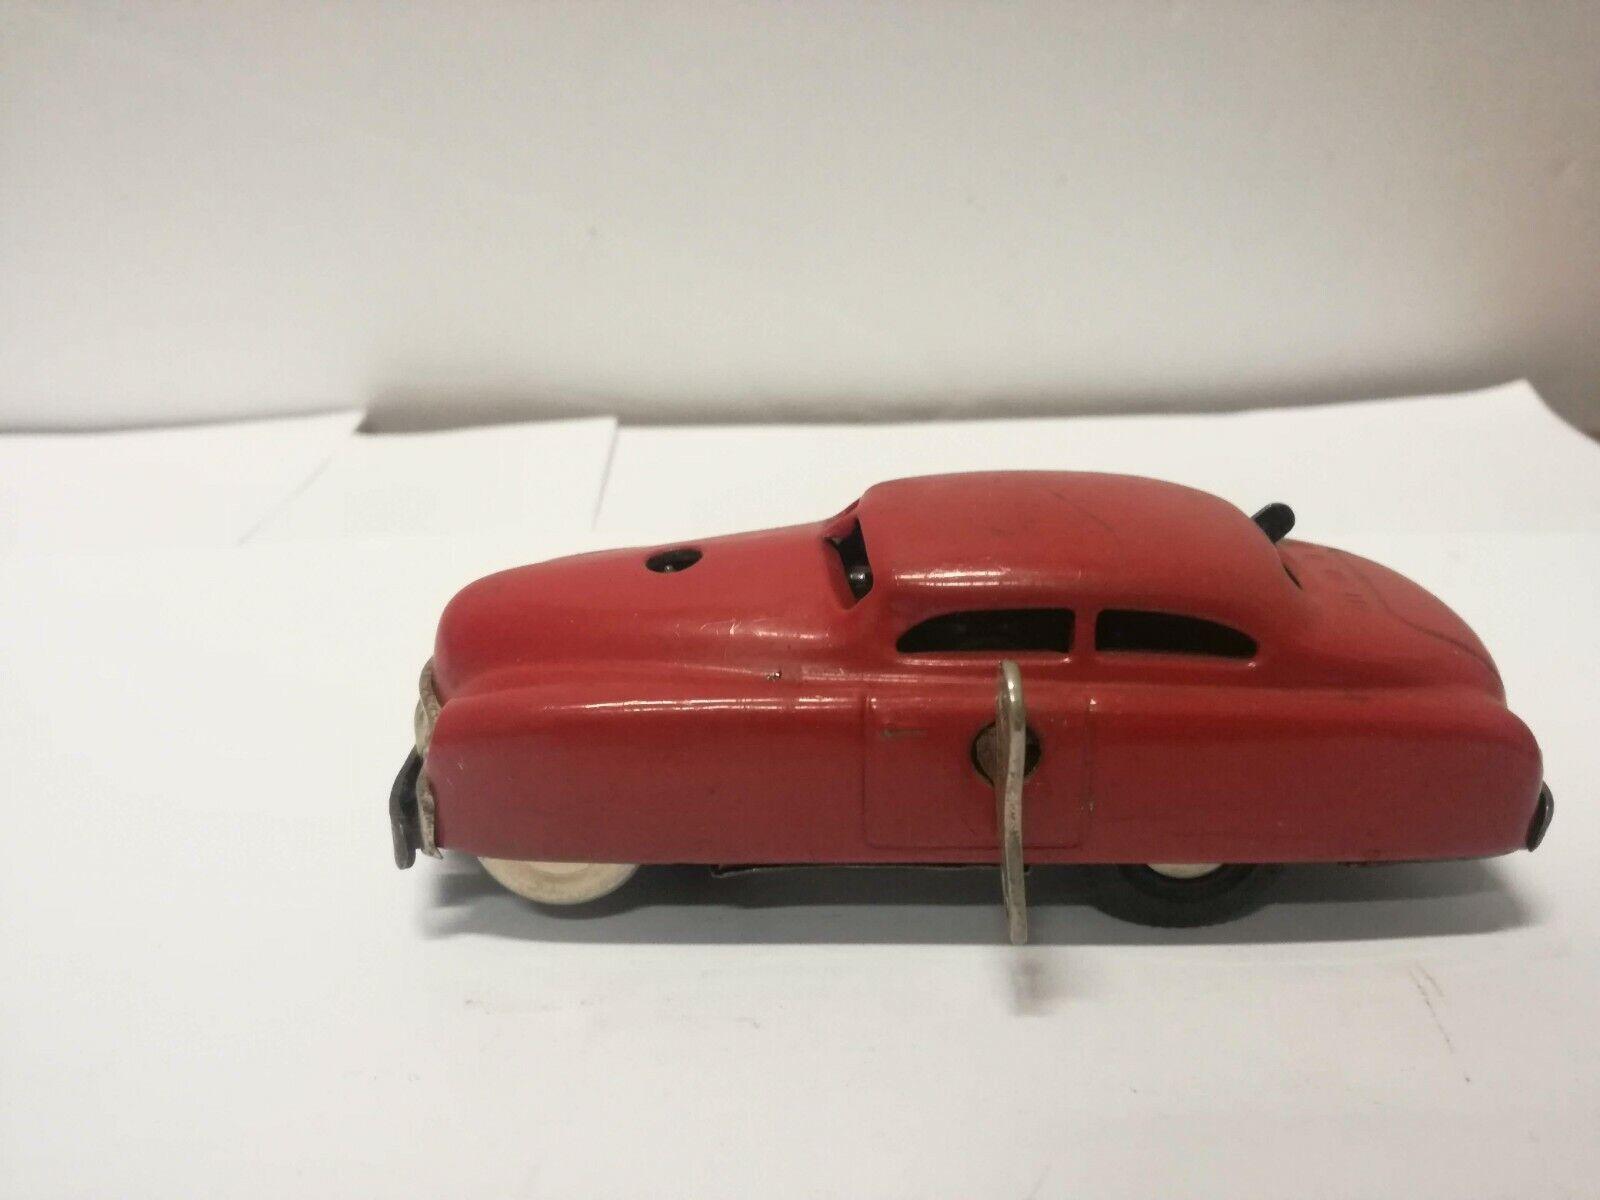 SCHUCO VARIANTO LIMO CAR 3041 rojo CLOCKWORK WINDING KEY 1955 CAR MODEL